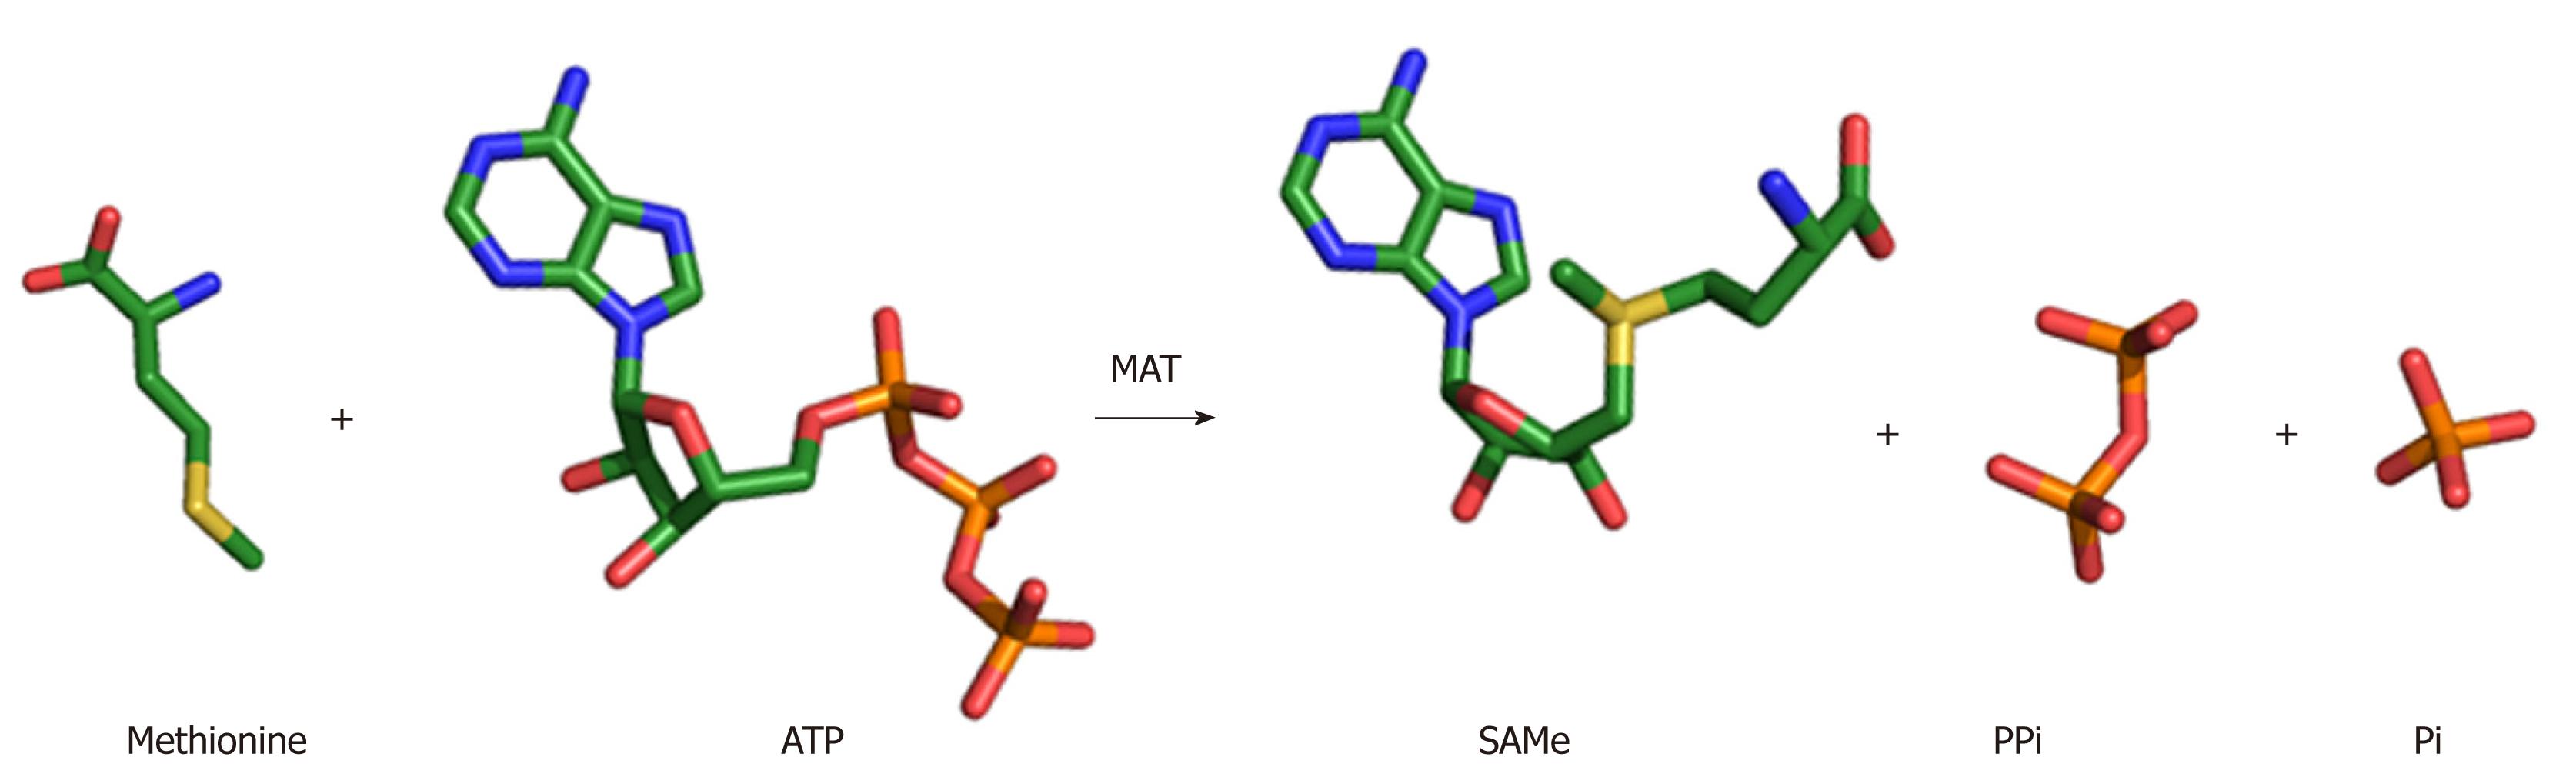 Methionine adenosyltransferases in liver cancer